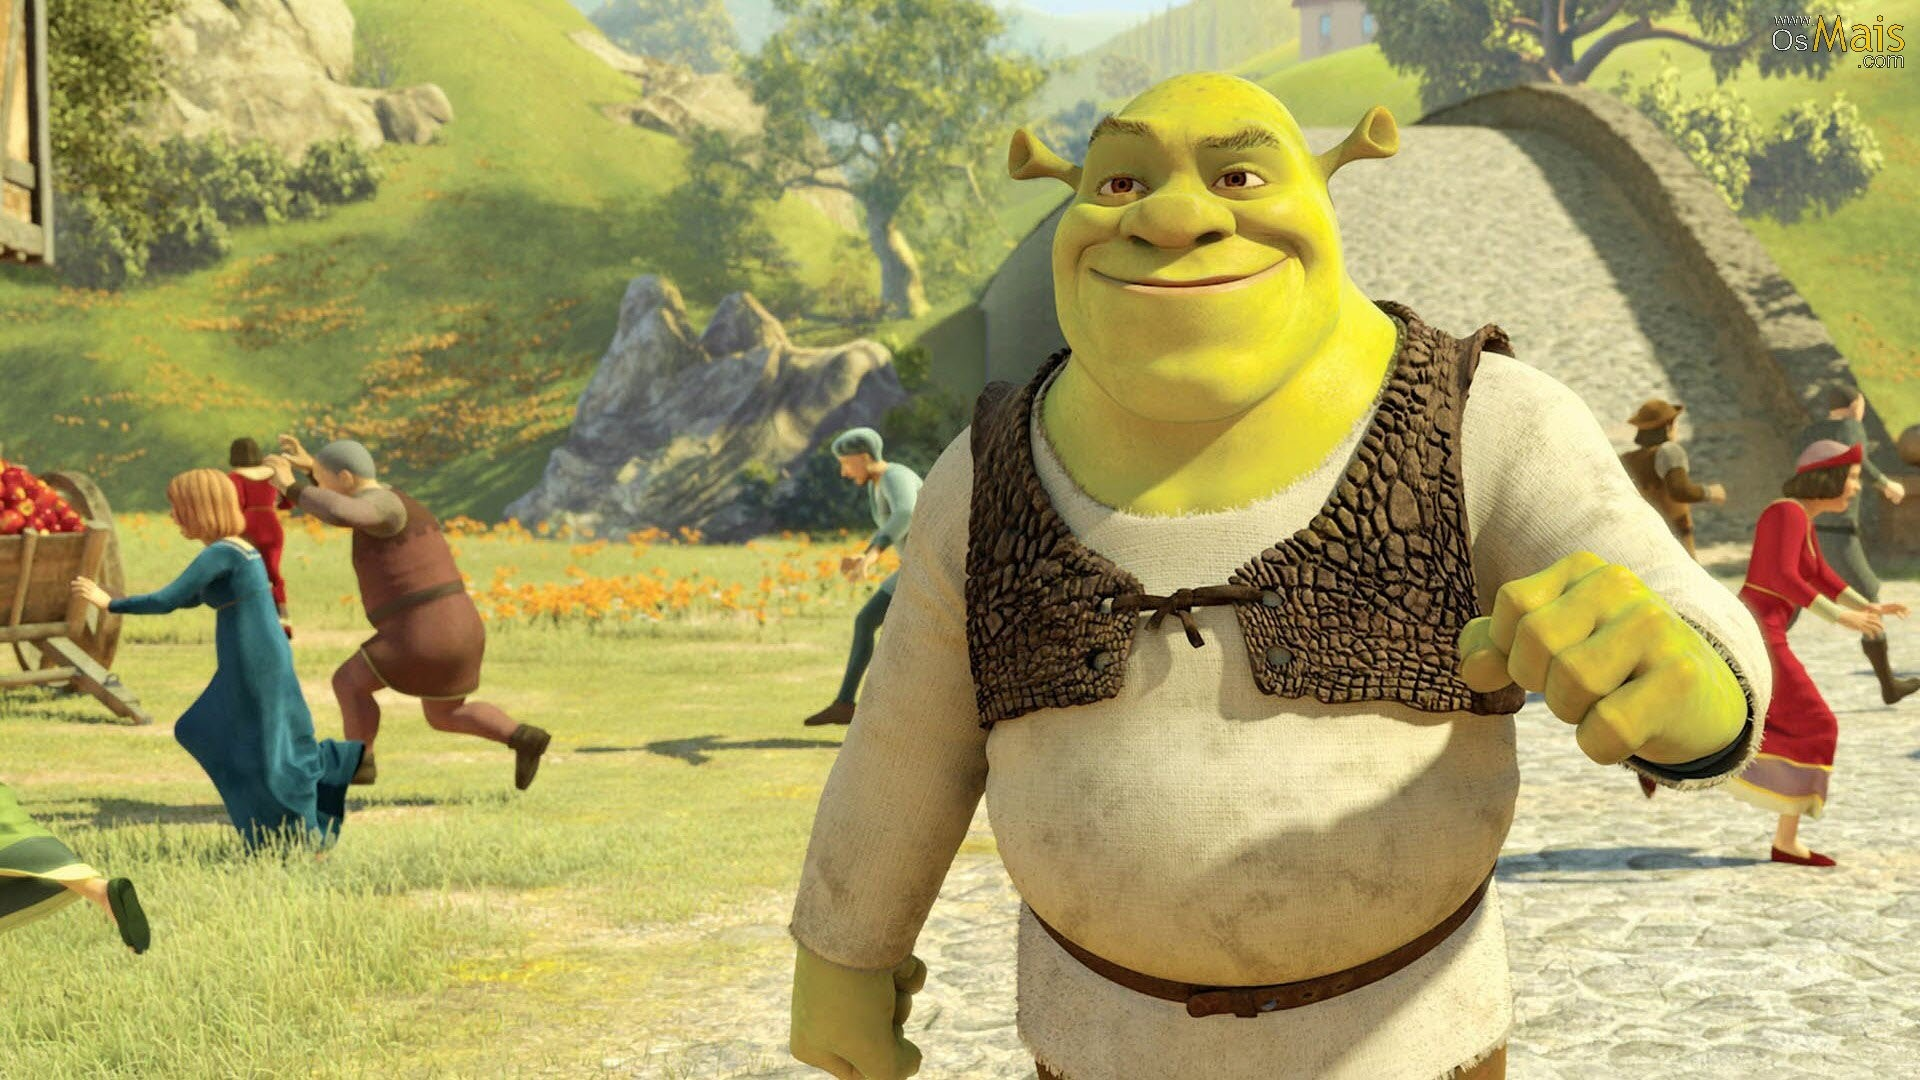 Shrek Wallpaper 70 Pictures